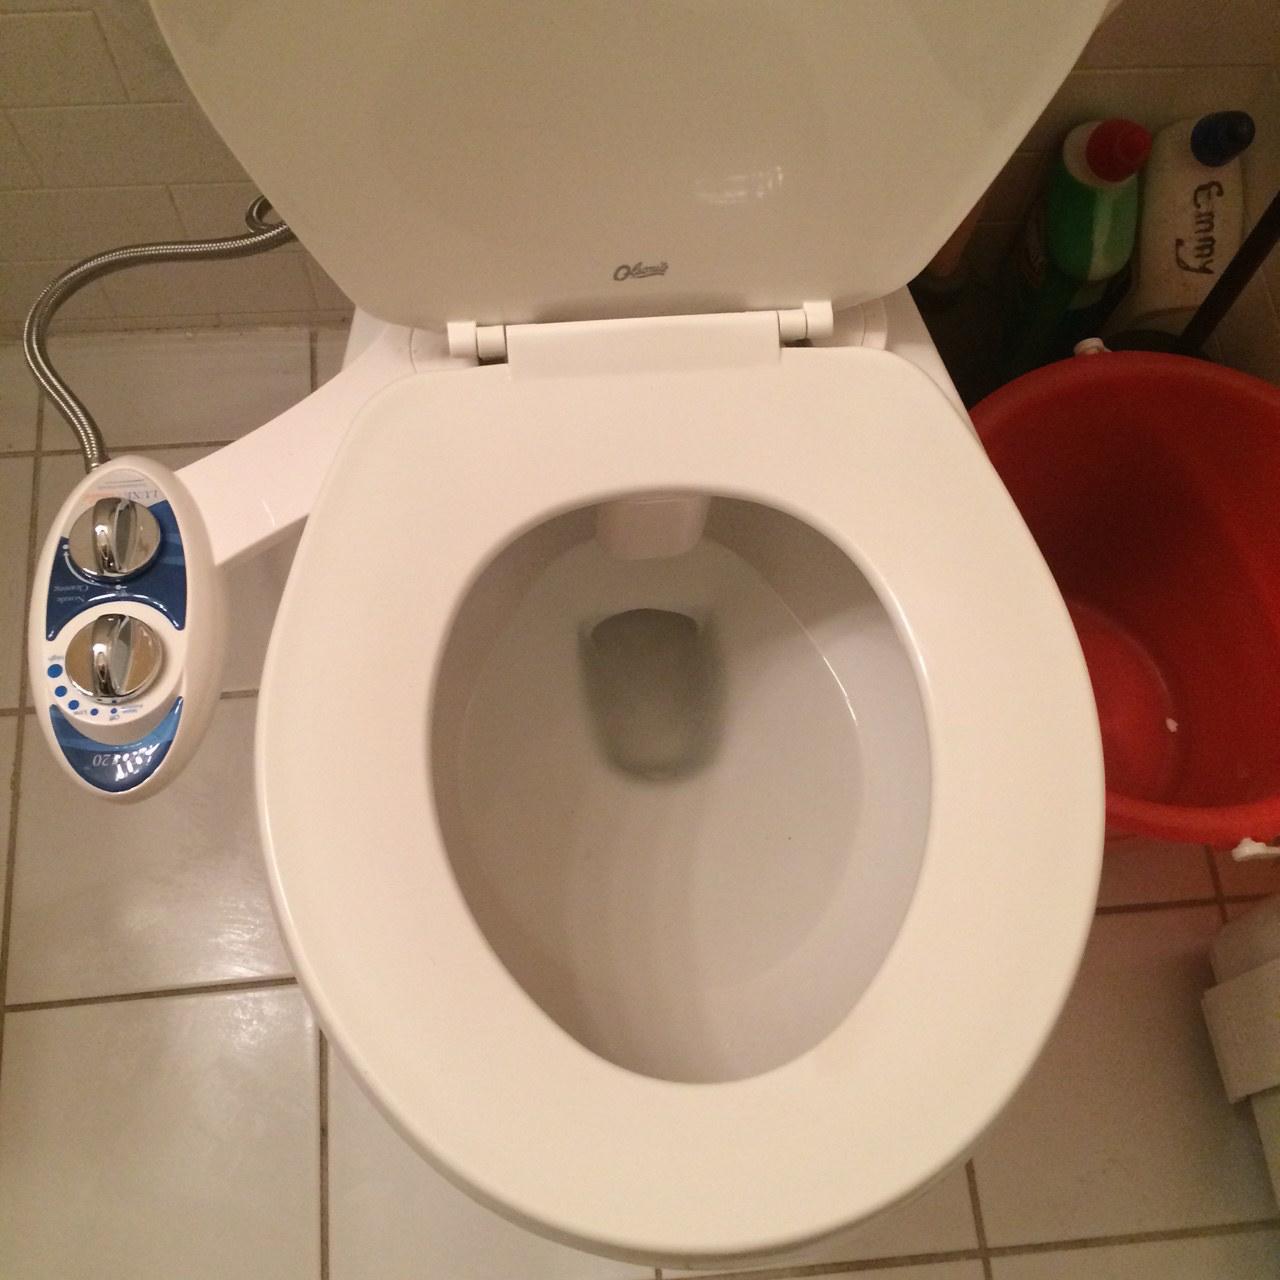 Pleasing This Bidet Has Made My Butt Cleaner Than Ever Uwap Interior Chair Design Uwaporg